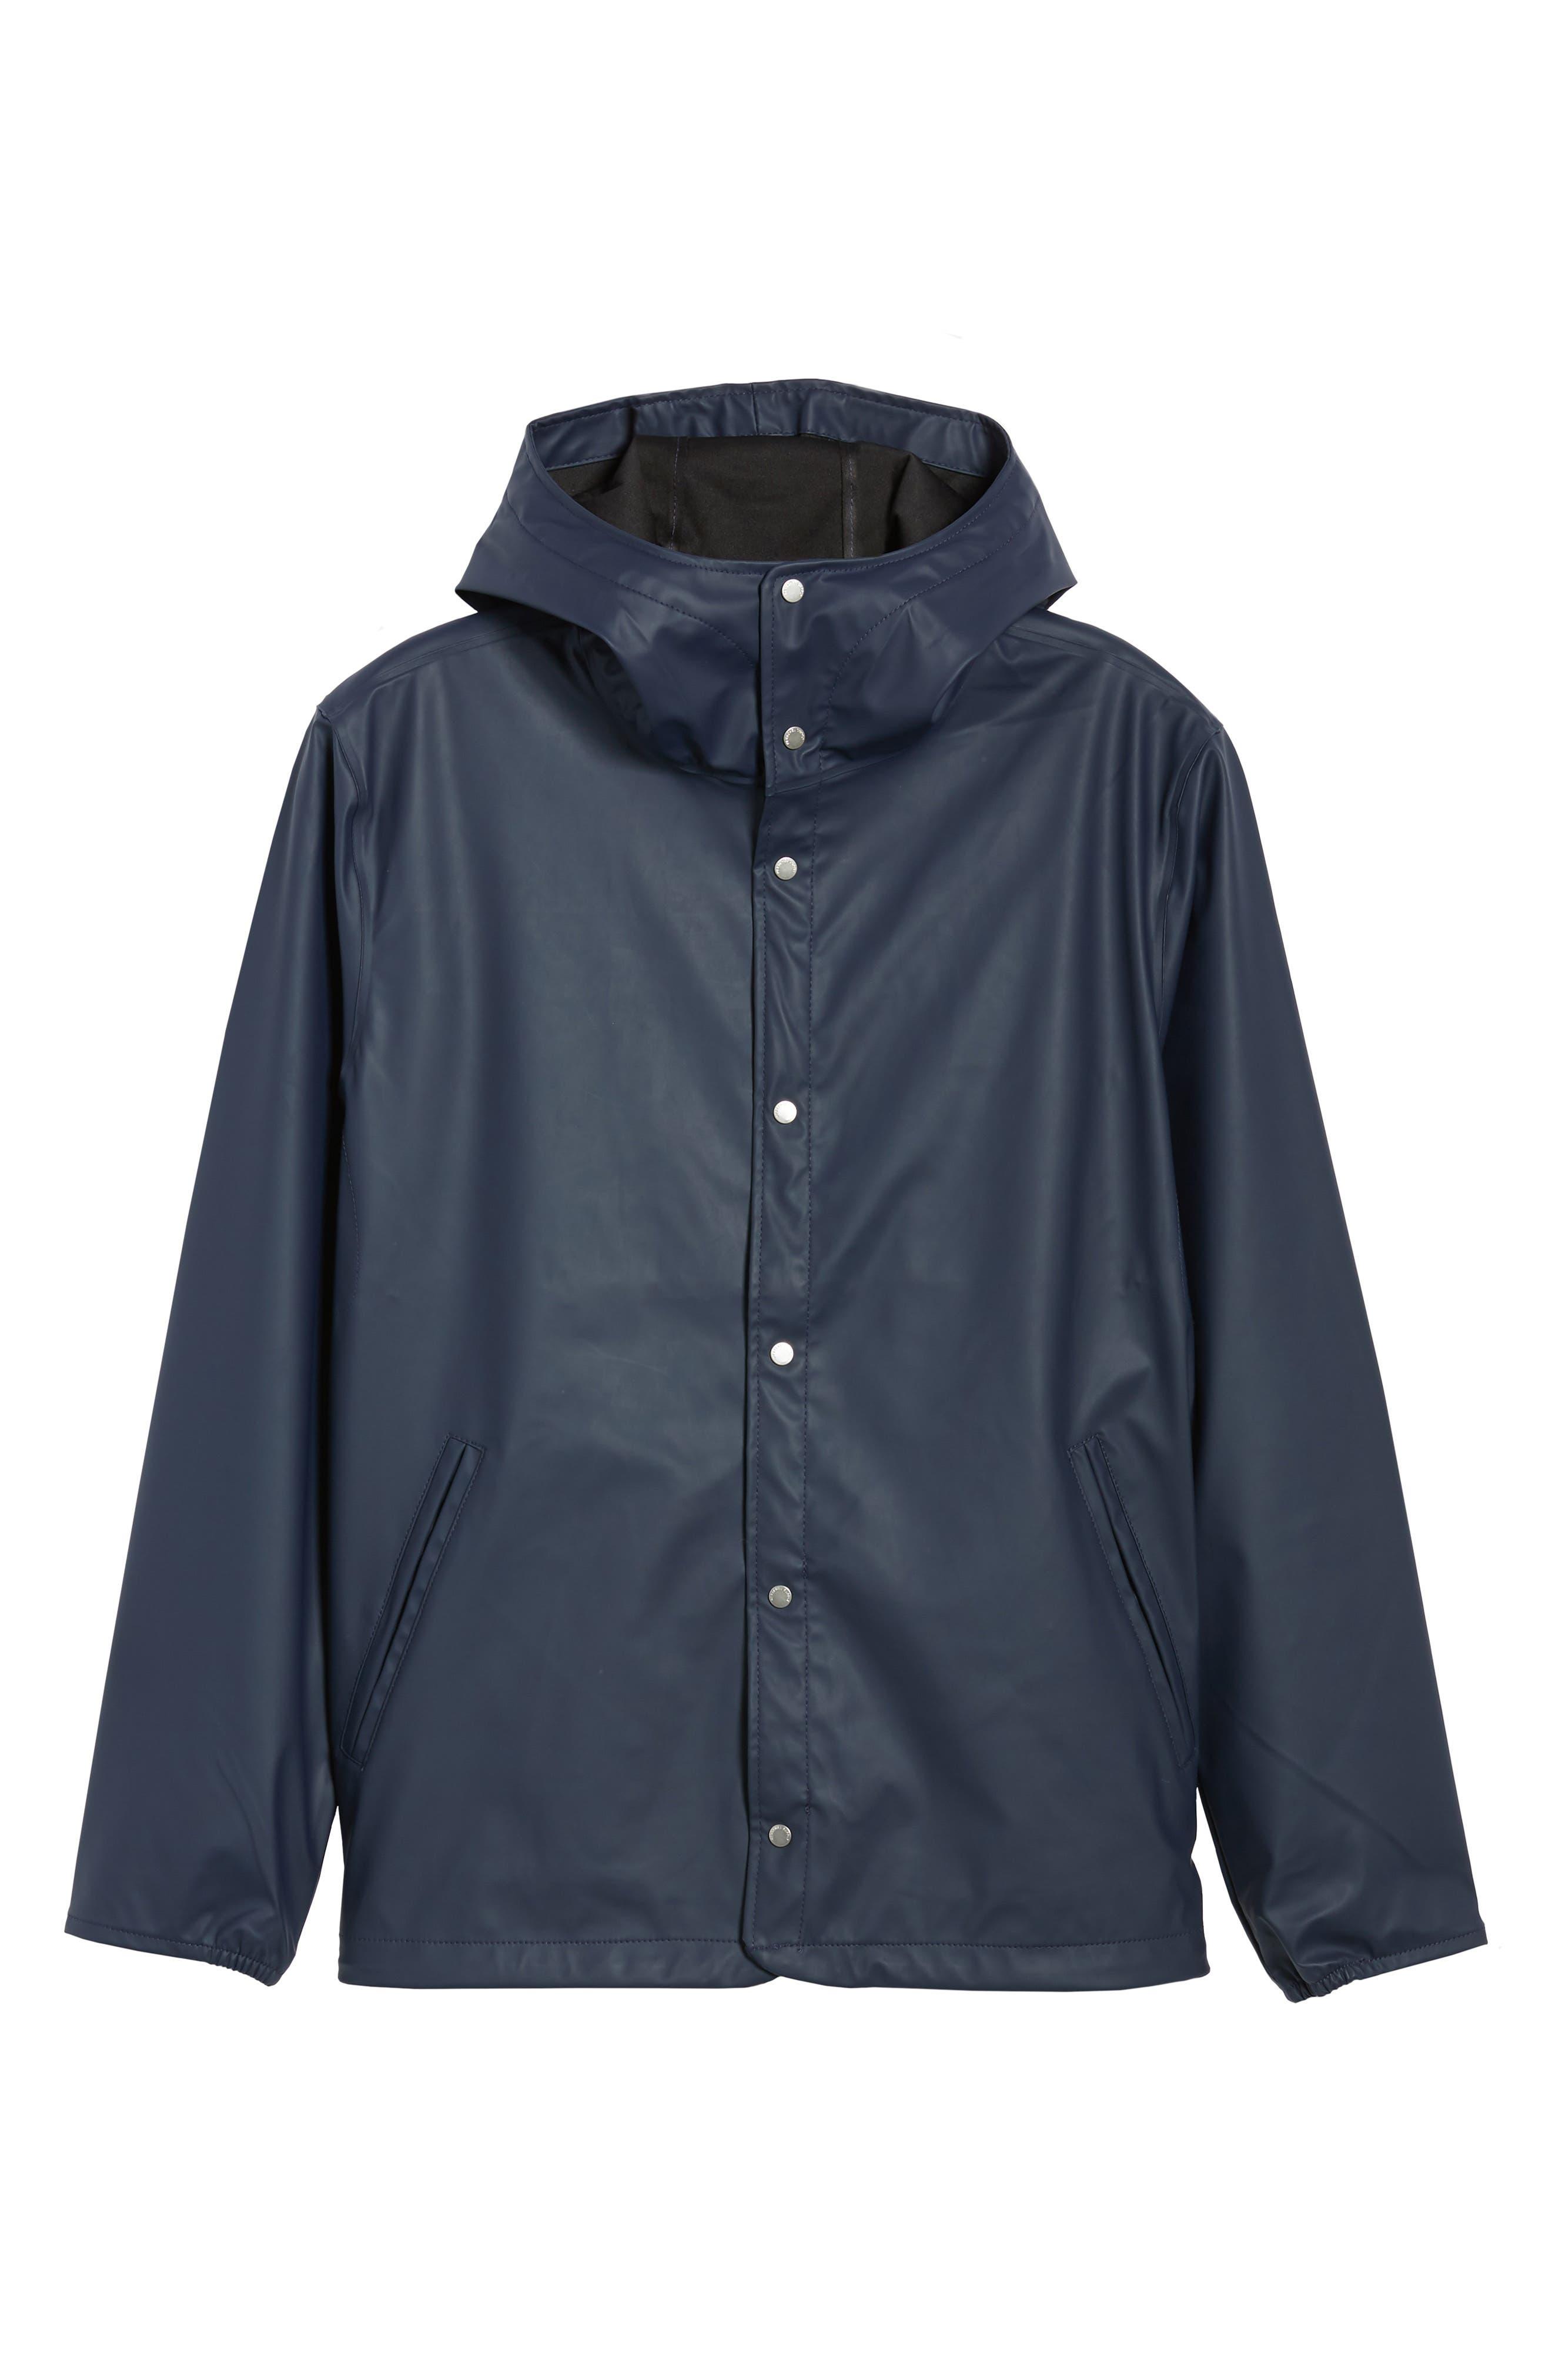 Forecast Hooded Coaches Jacket,                         Main,                         color, Peacoat/ Peacoat